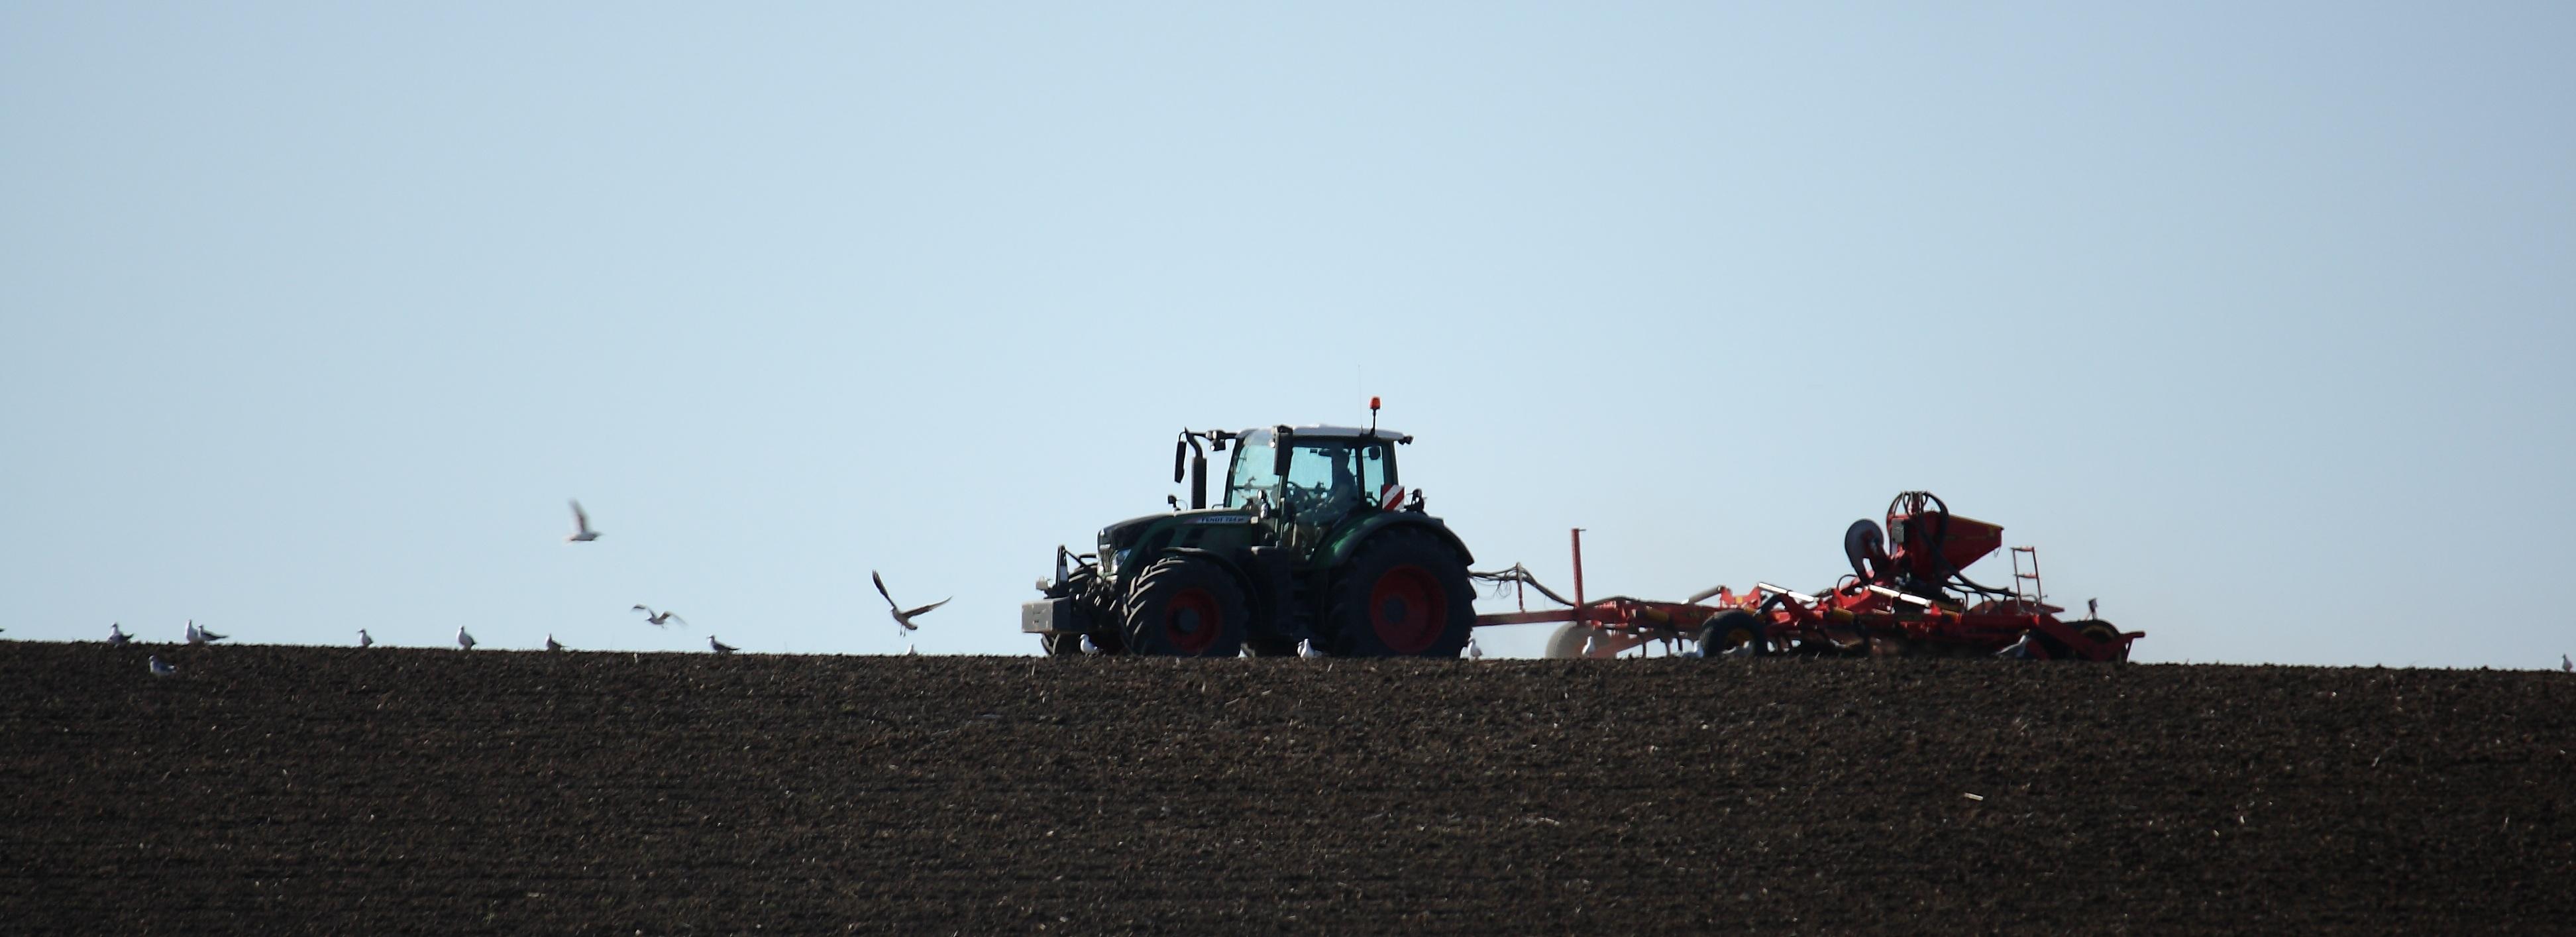 tractor-field-asphalt-crop-soil-agriculture-493438-pxhere.com